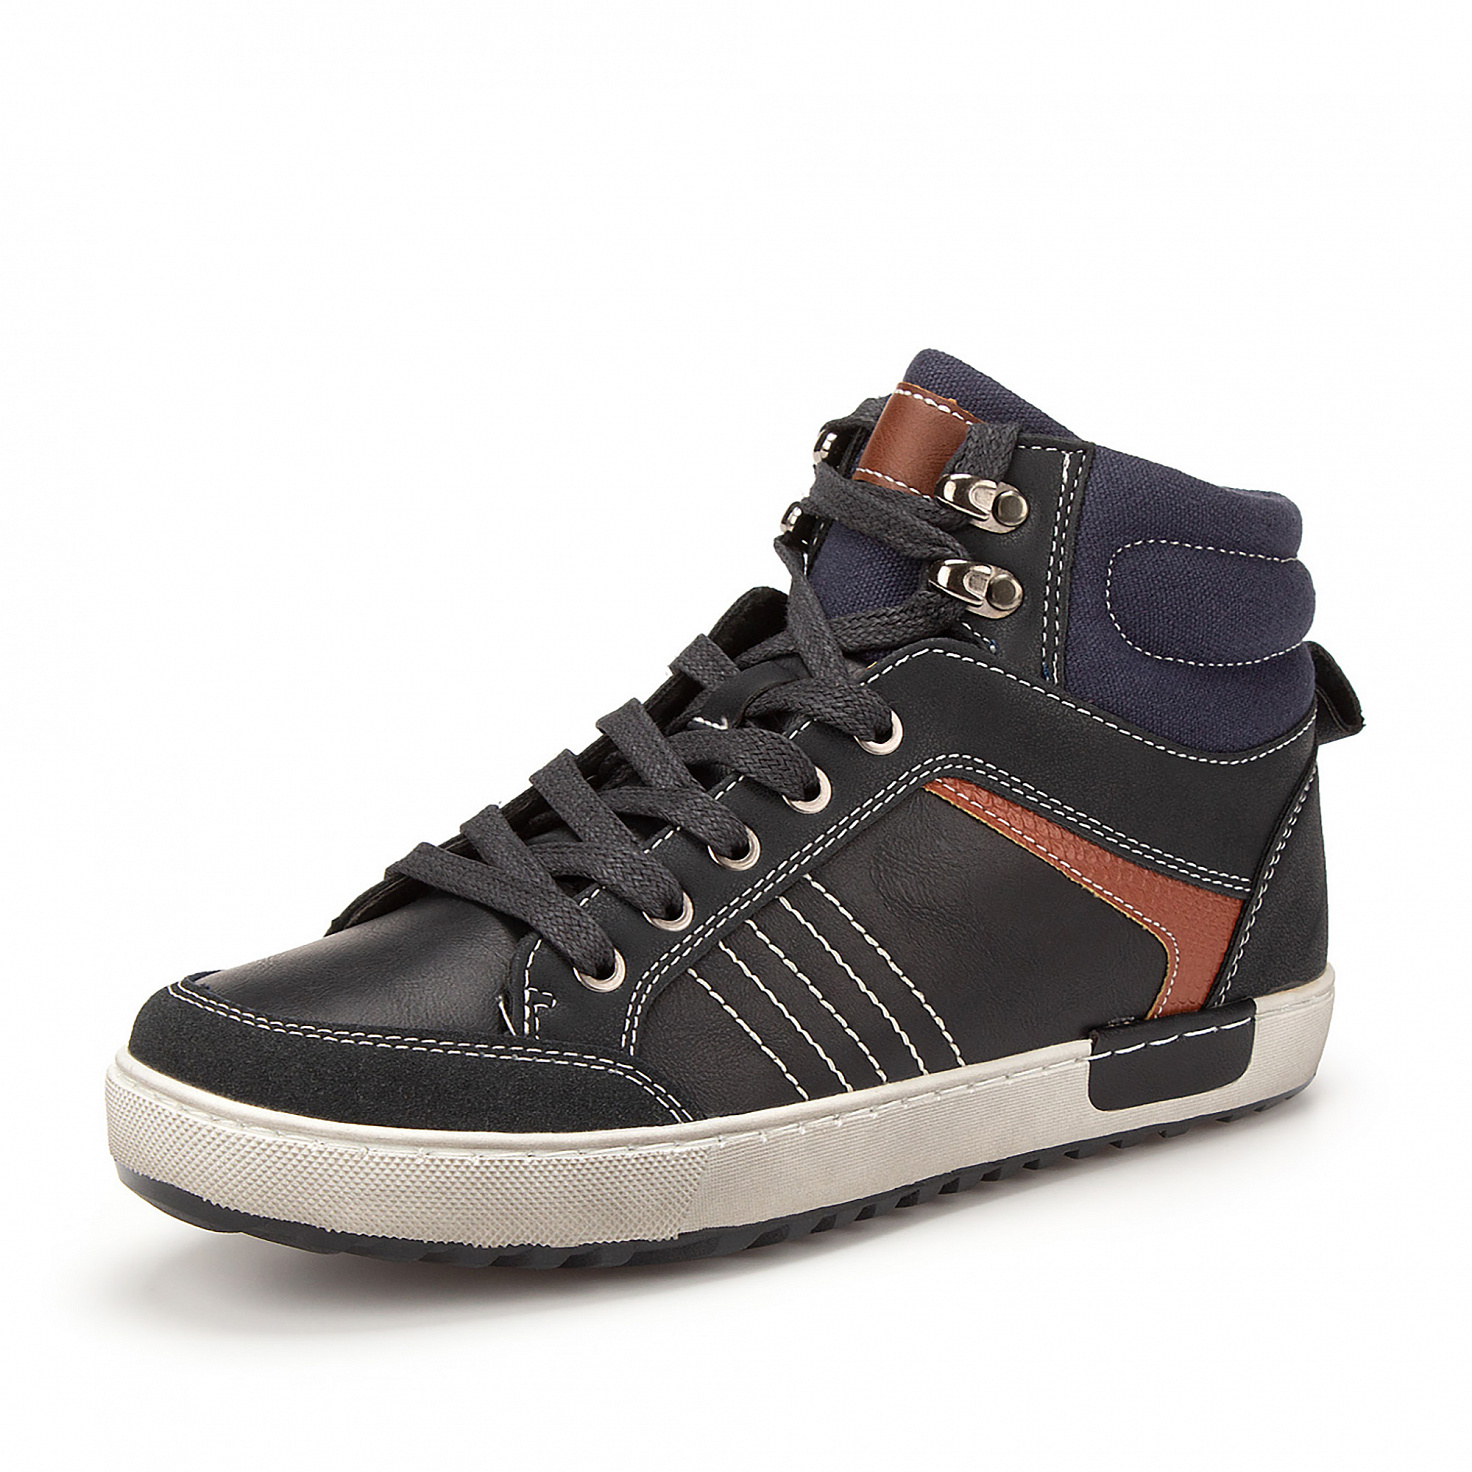 Купить 189-02BO-032SR, Ботинки для мальчиков ZENDEN, цв. синий, р-р 38,